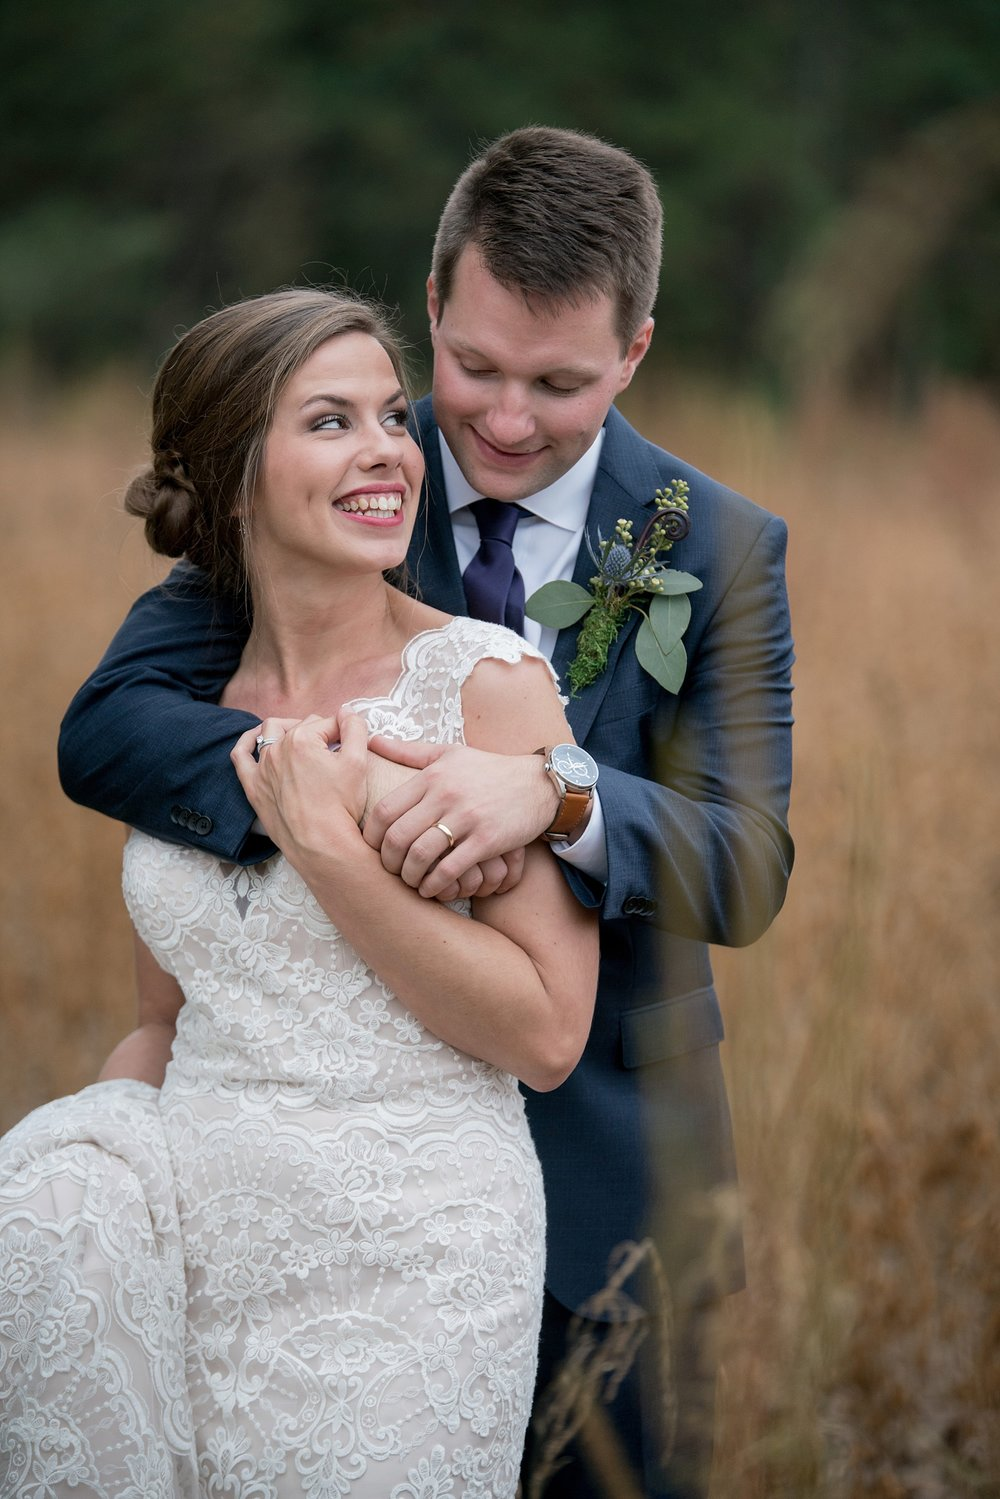 Myrtle-Grove-Plantation-Wedding-Photographer-NC-143.jpg